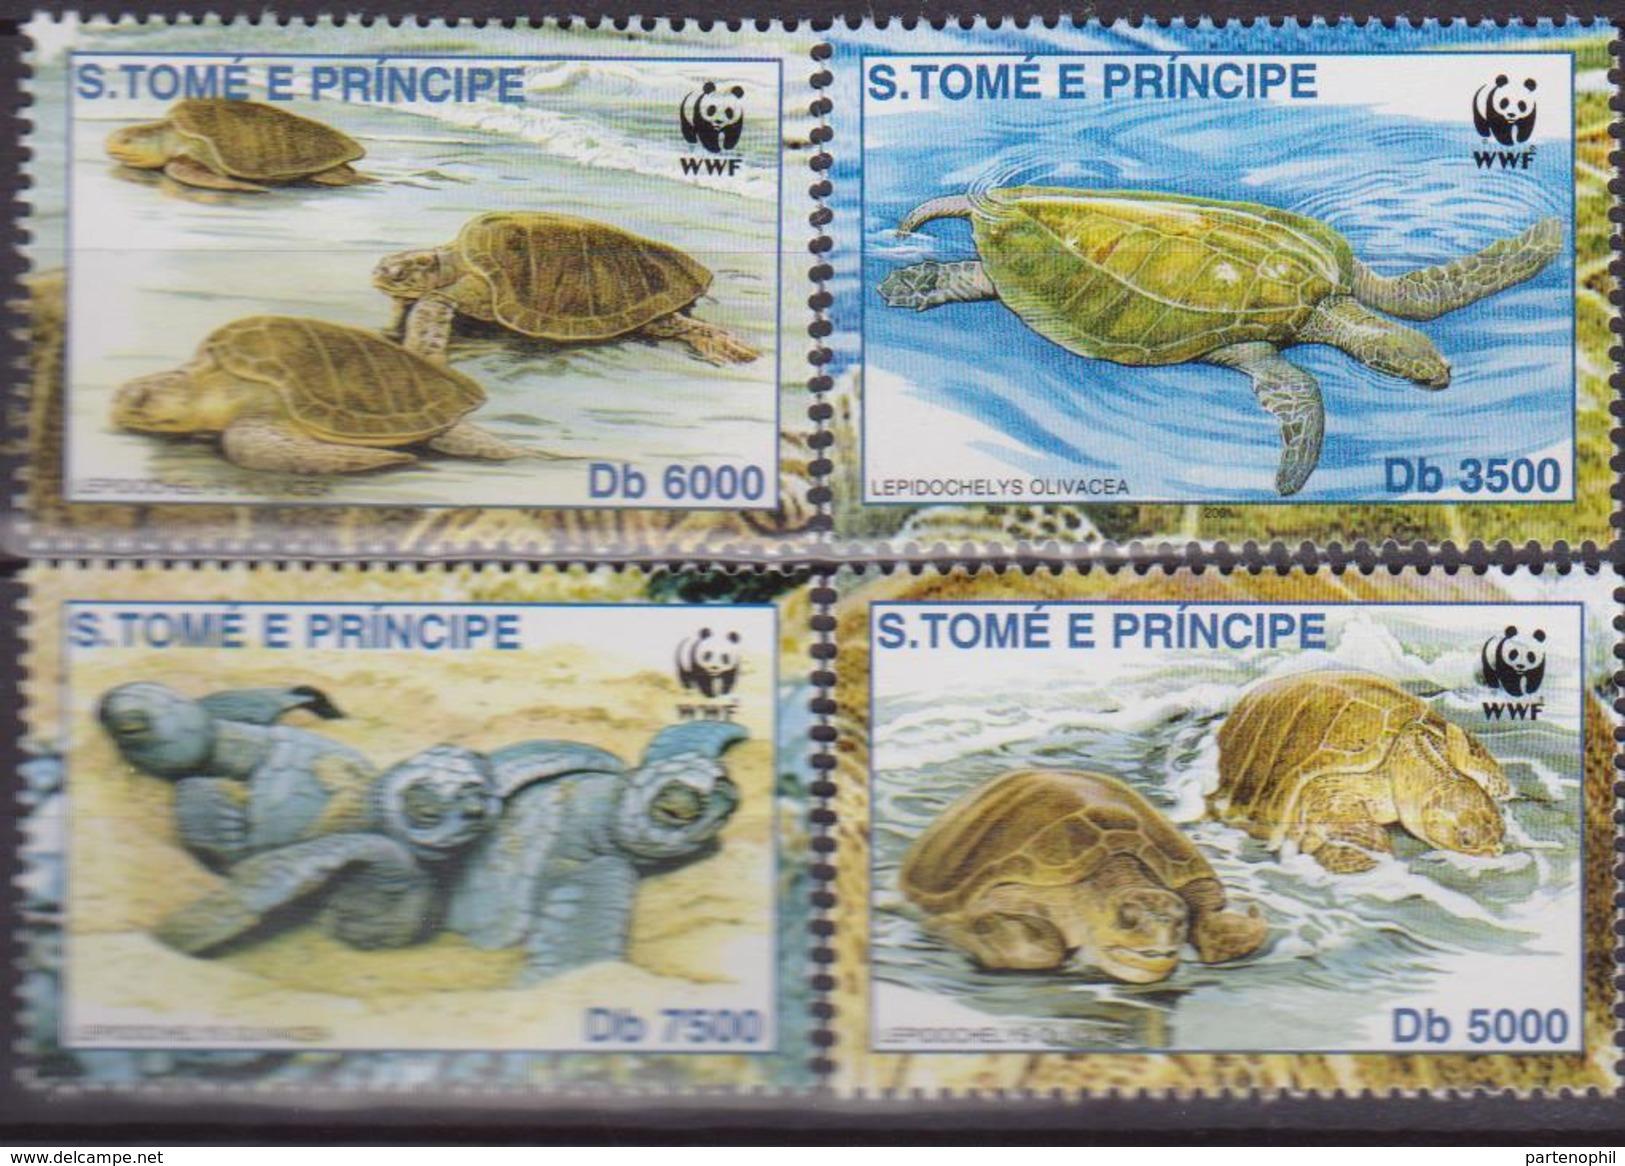 S.TOME E PRINCIPE Wwf Tartarughe Turtles4 V. Mnh - W.W.F.